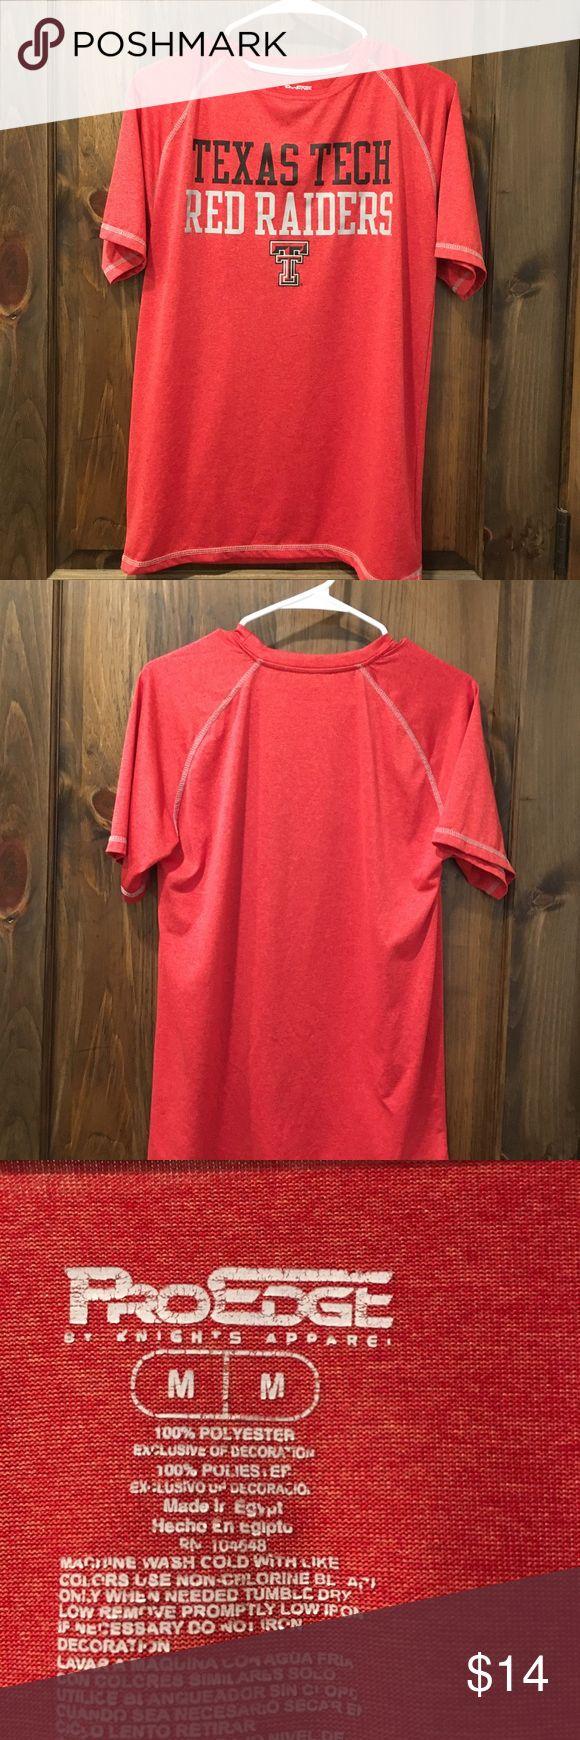 Texas Tech Athletic Shirt Texas Tech Athletic Shirt Pro Edge Shirts Tees - Short Sleeve